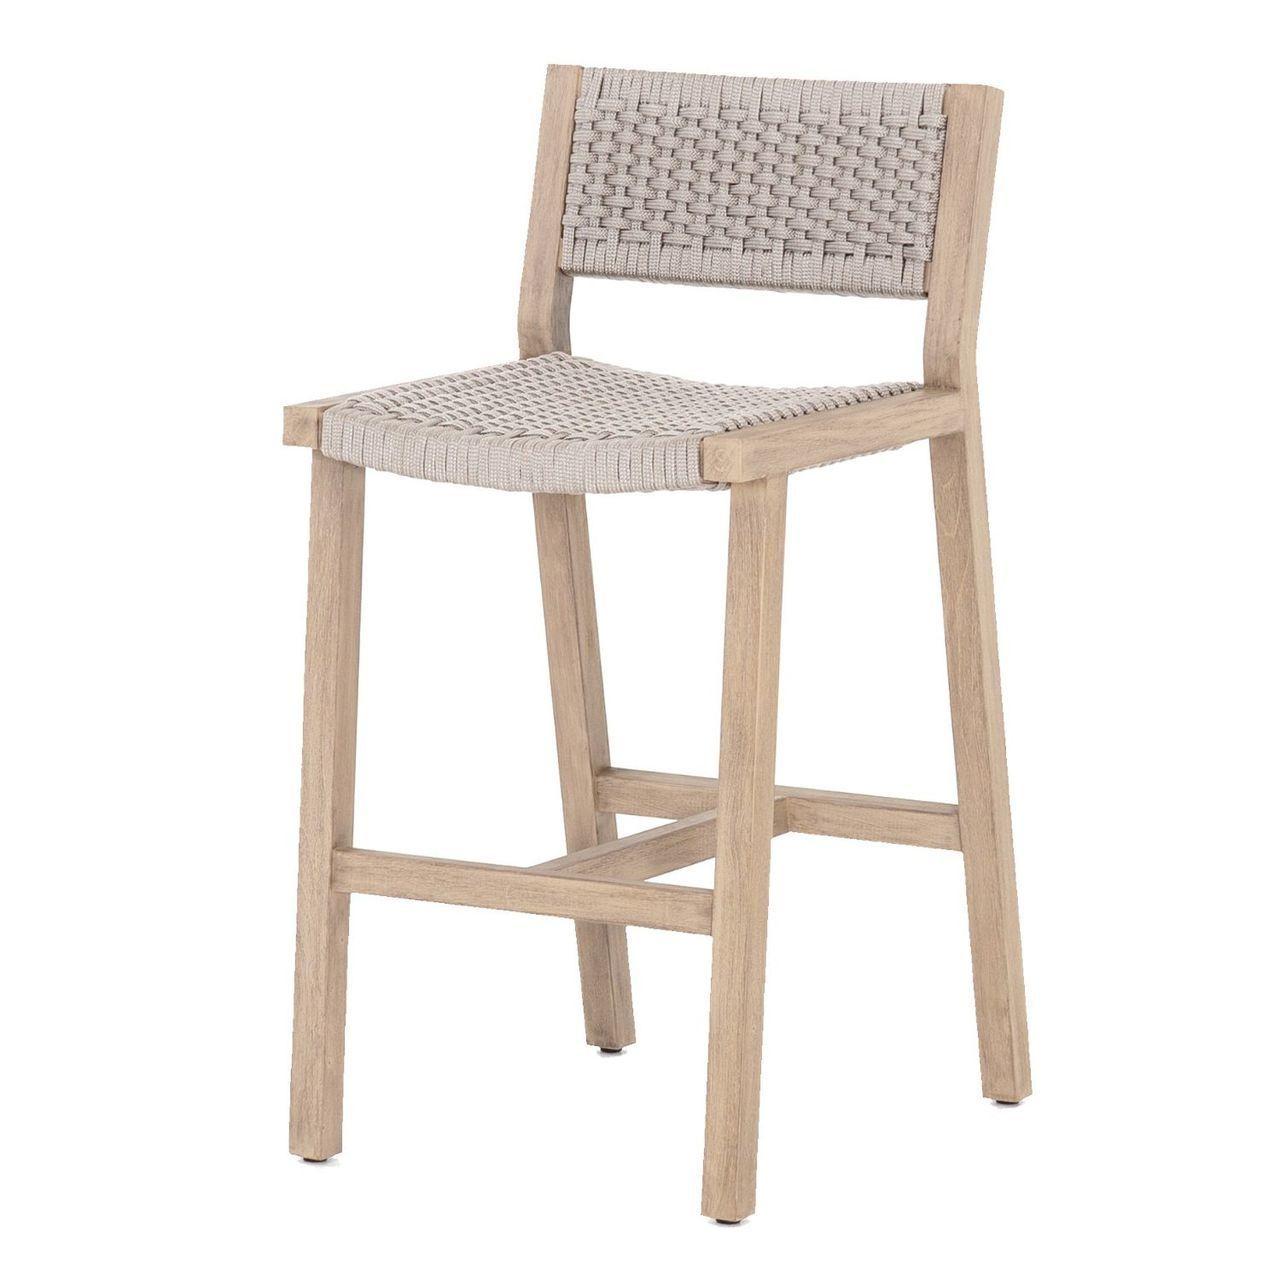 Delano Natural Teak Outdoor Rope Bar Stool Outdoor Bar Stools Bar Furniture Bar Furniture For Sale